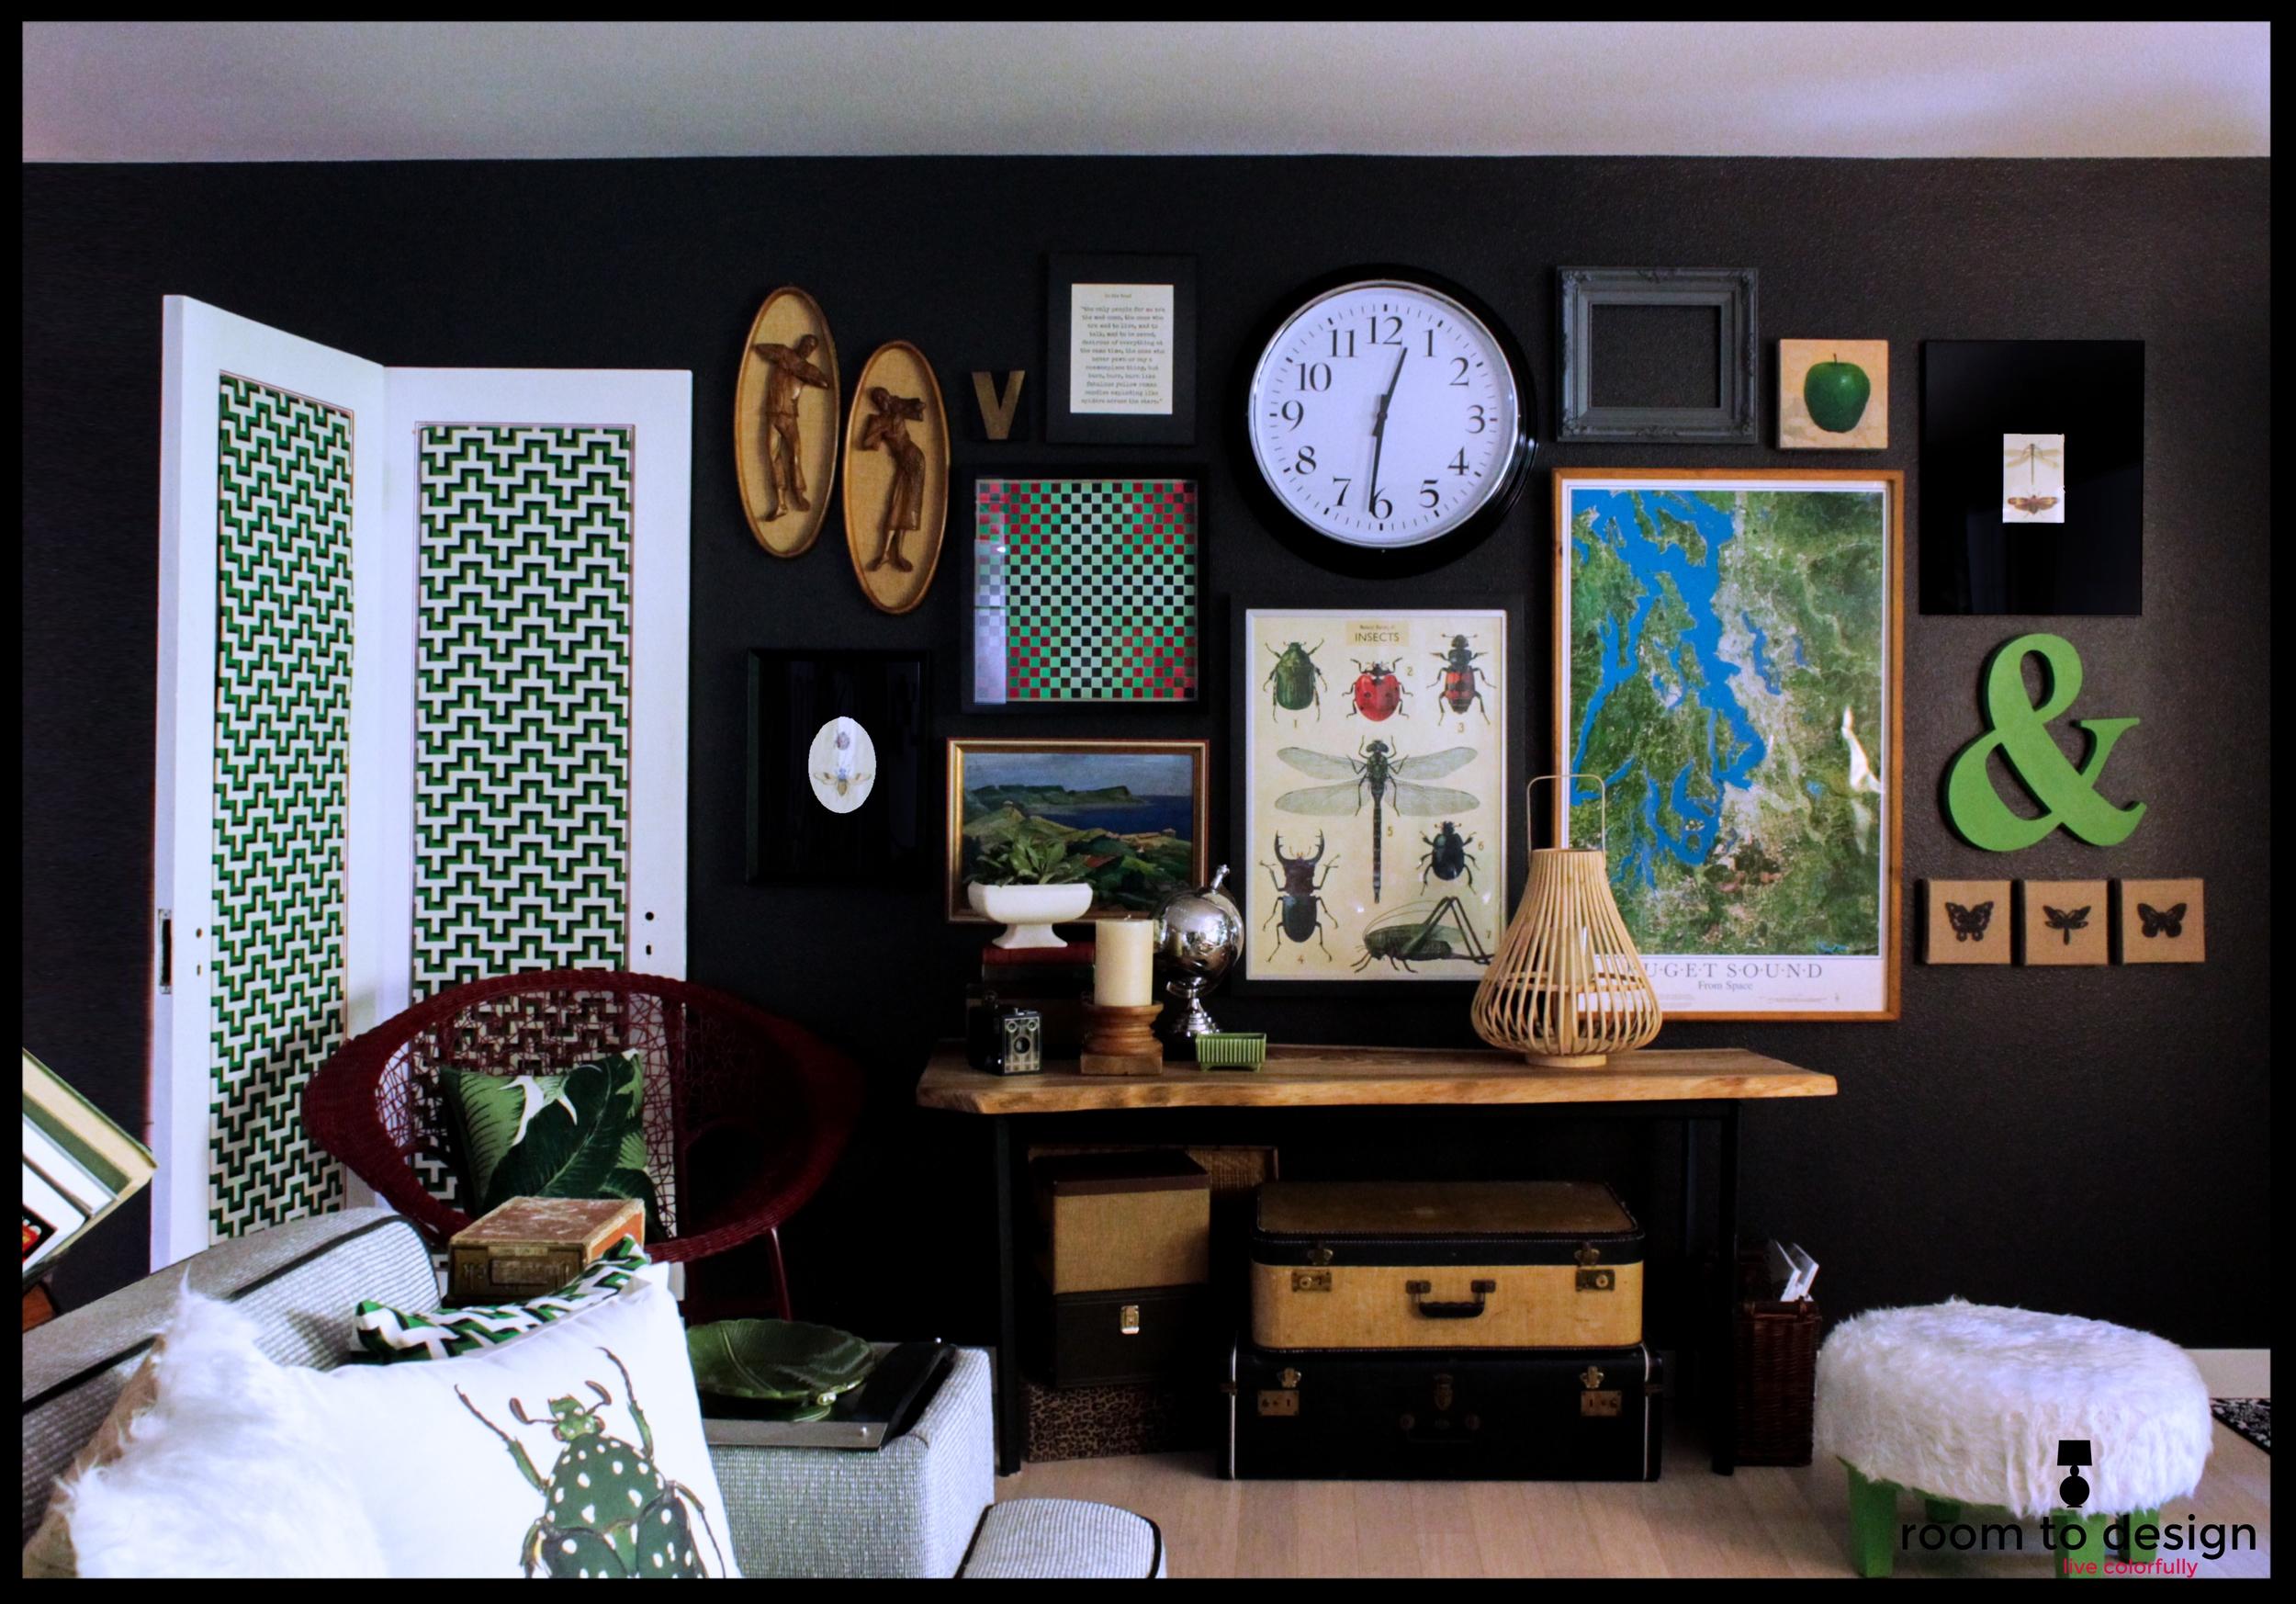 gallery_wall_woodinville_interior_design.jpg